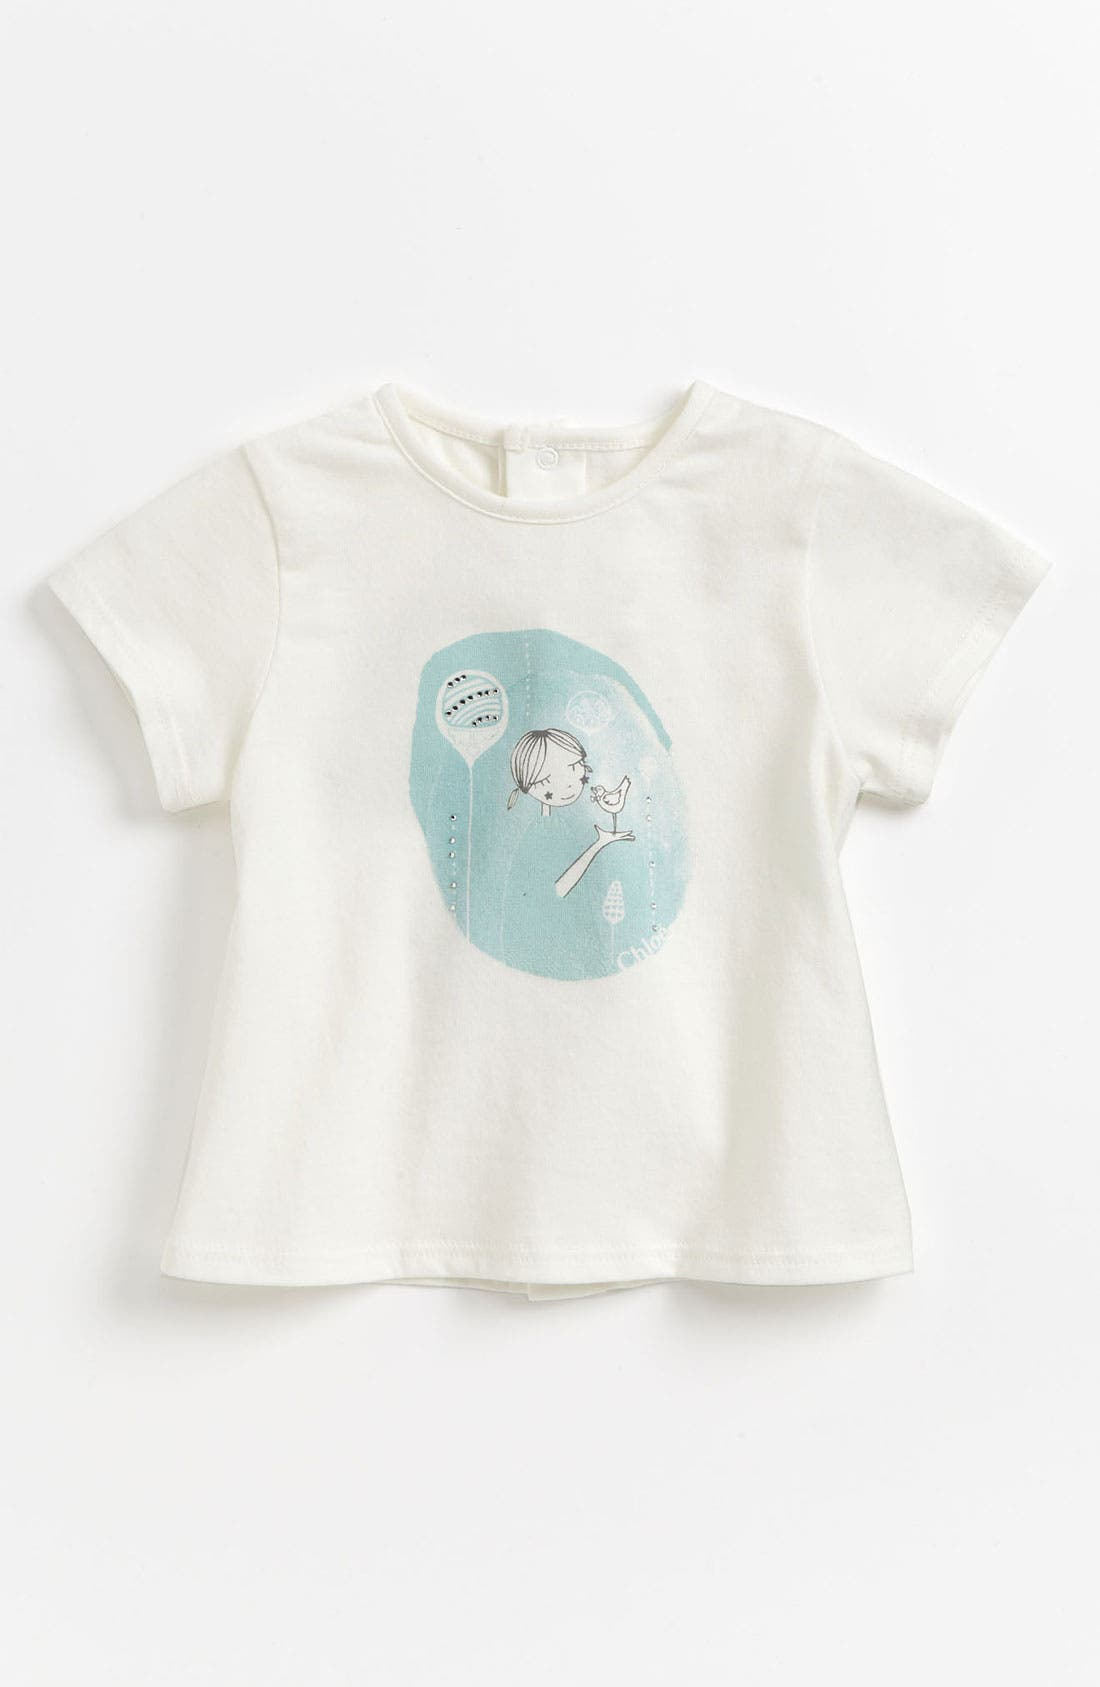 Alternate Image 1 Selected - Chloé Print Tee (Baby)